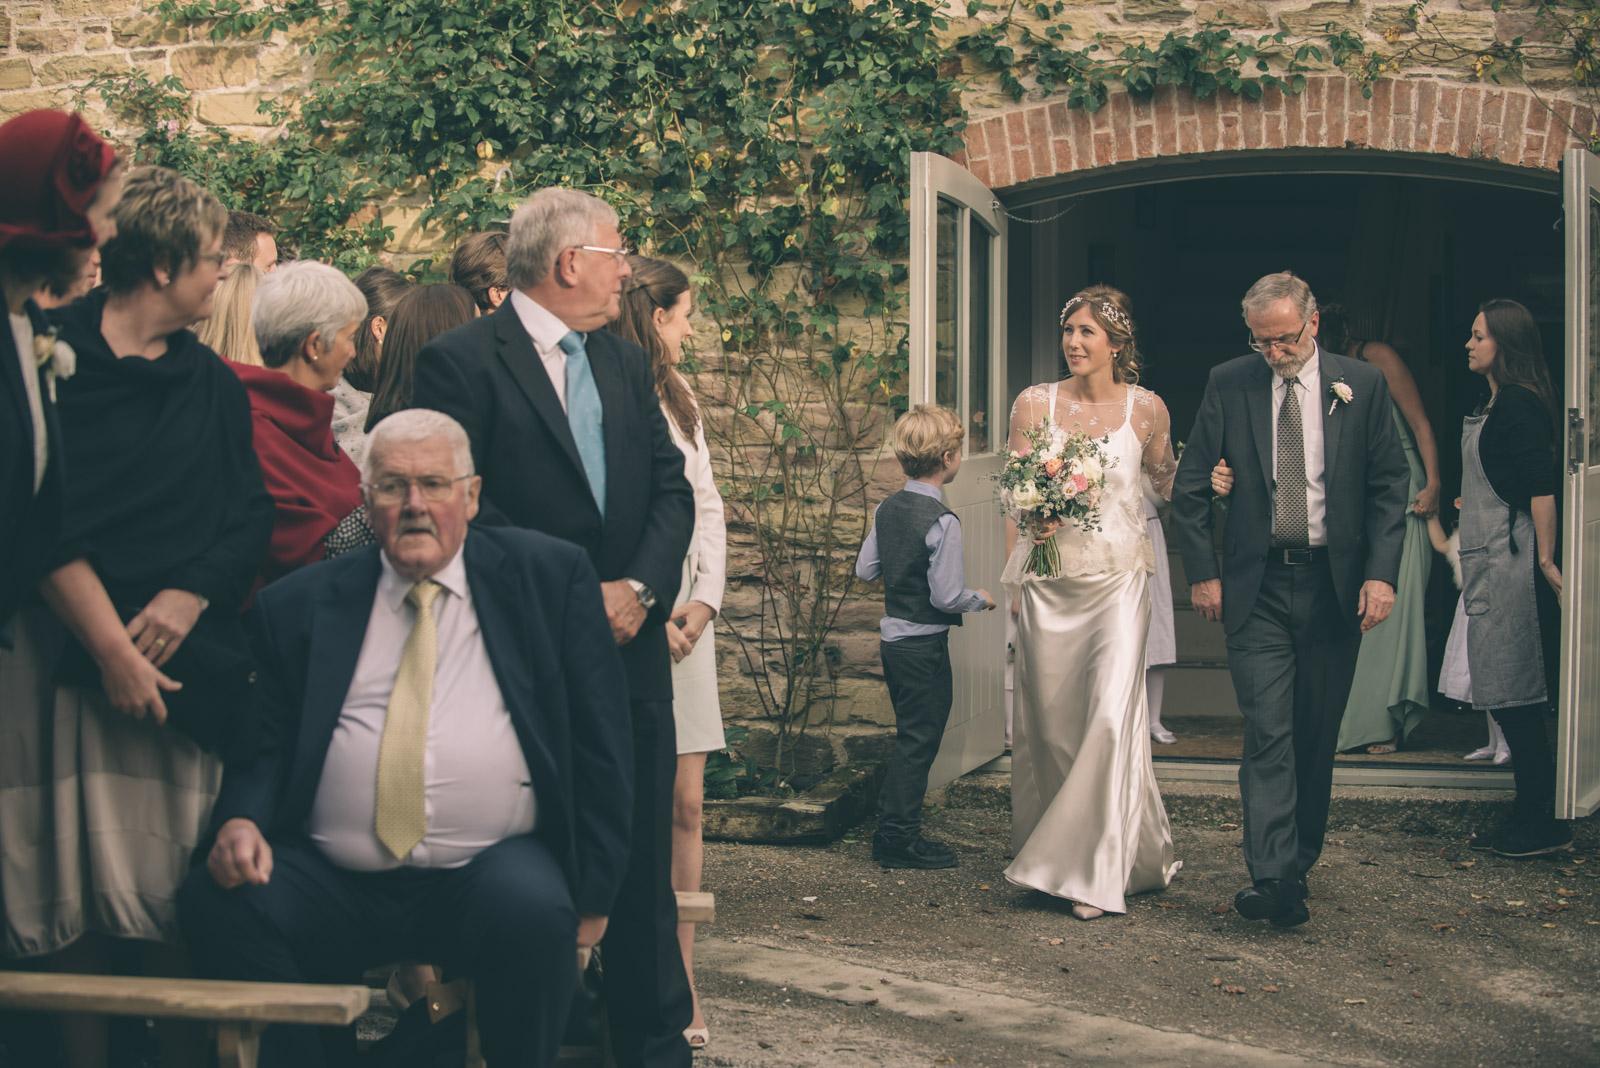 nancarrow-wedding-photography-36.jpg